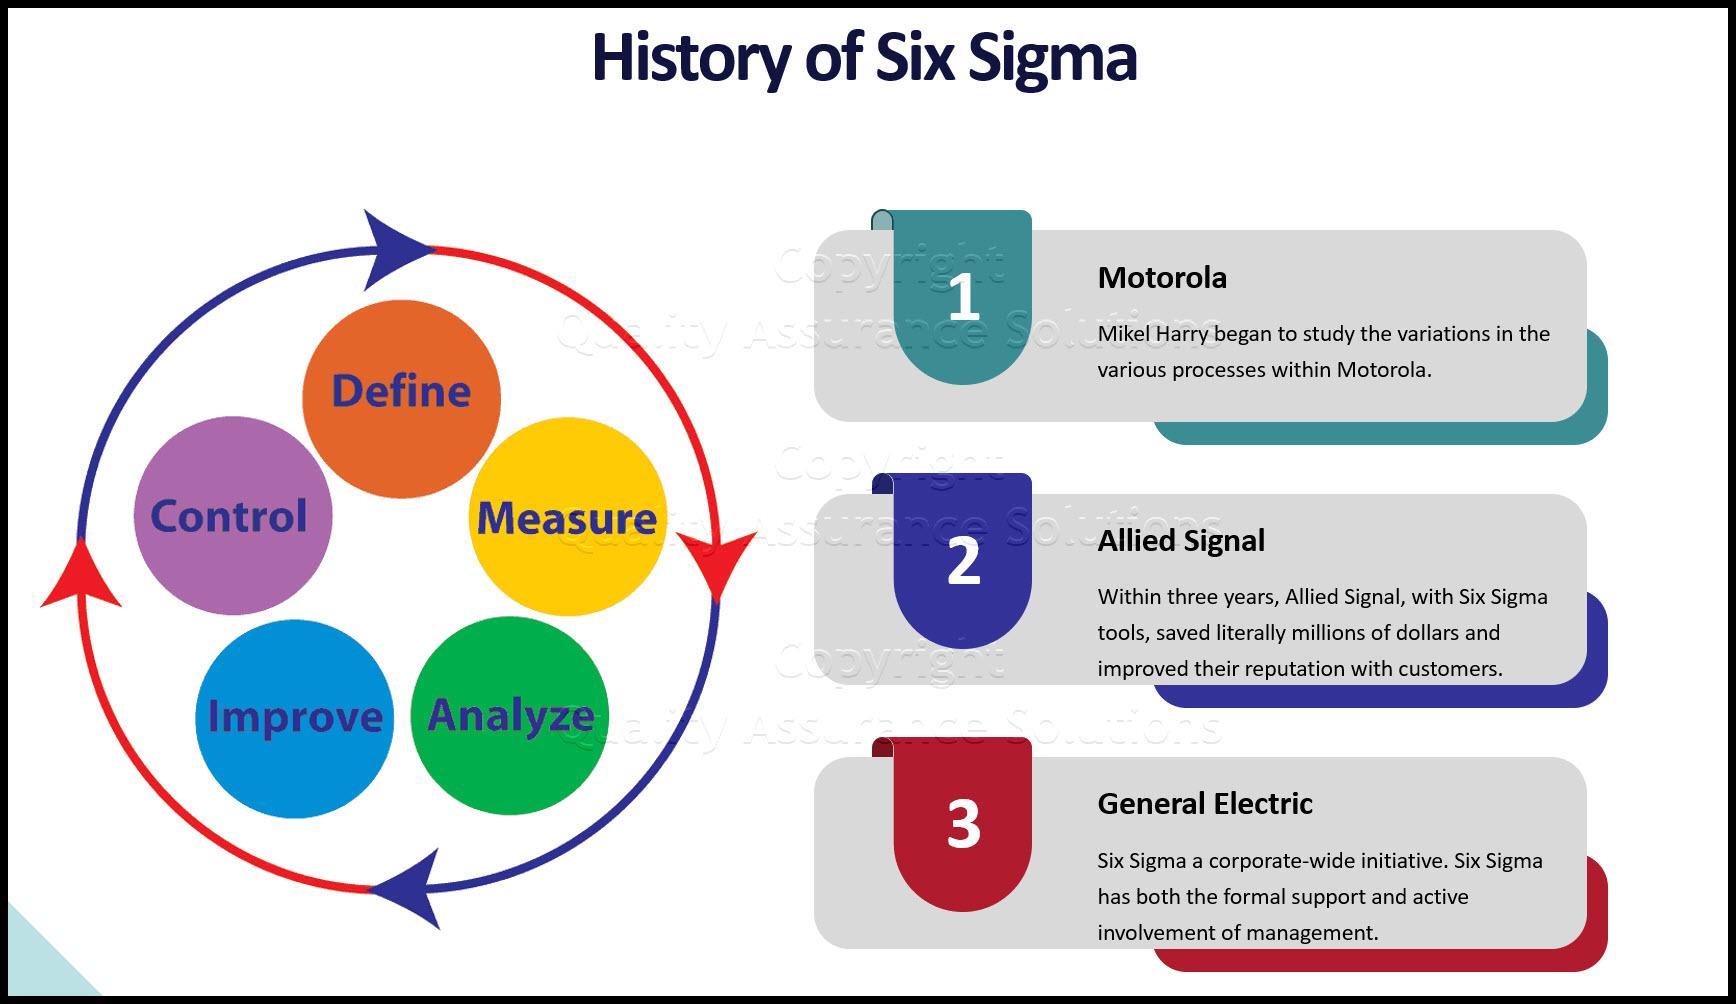 History of Six Sigma